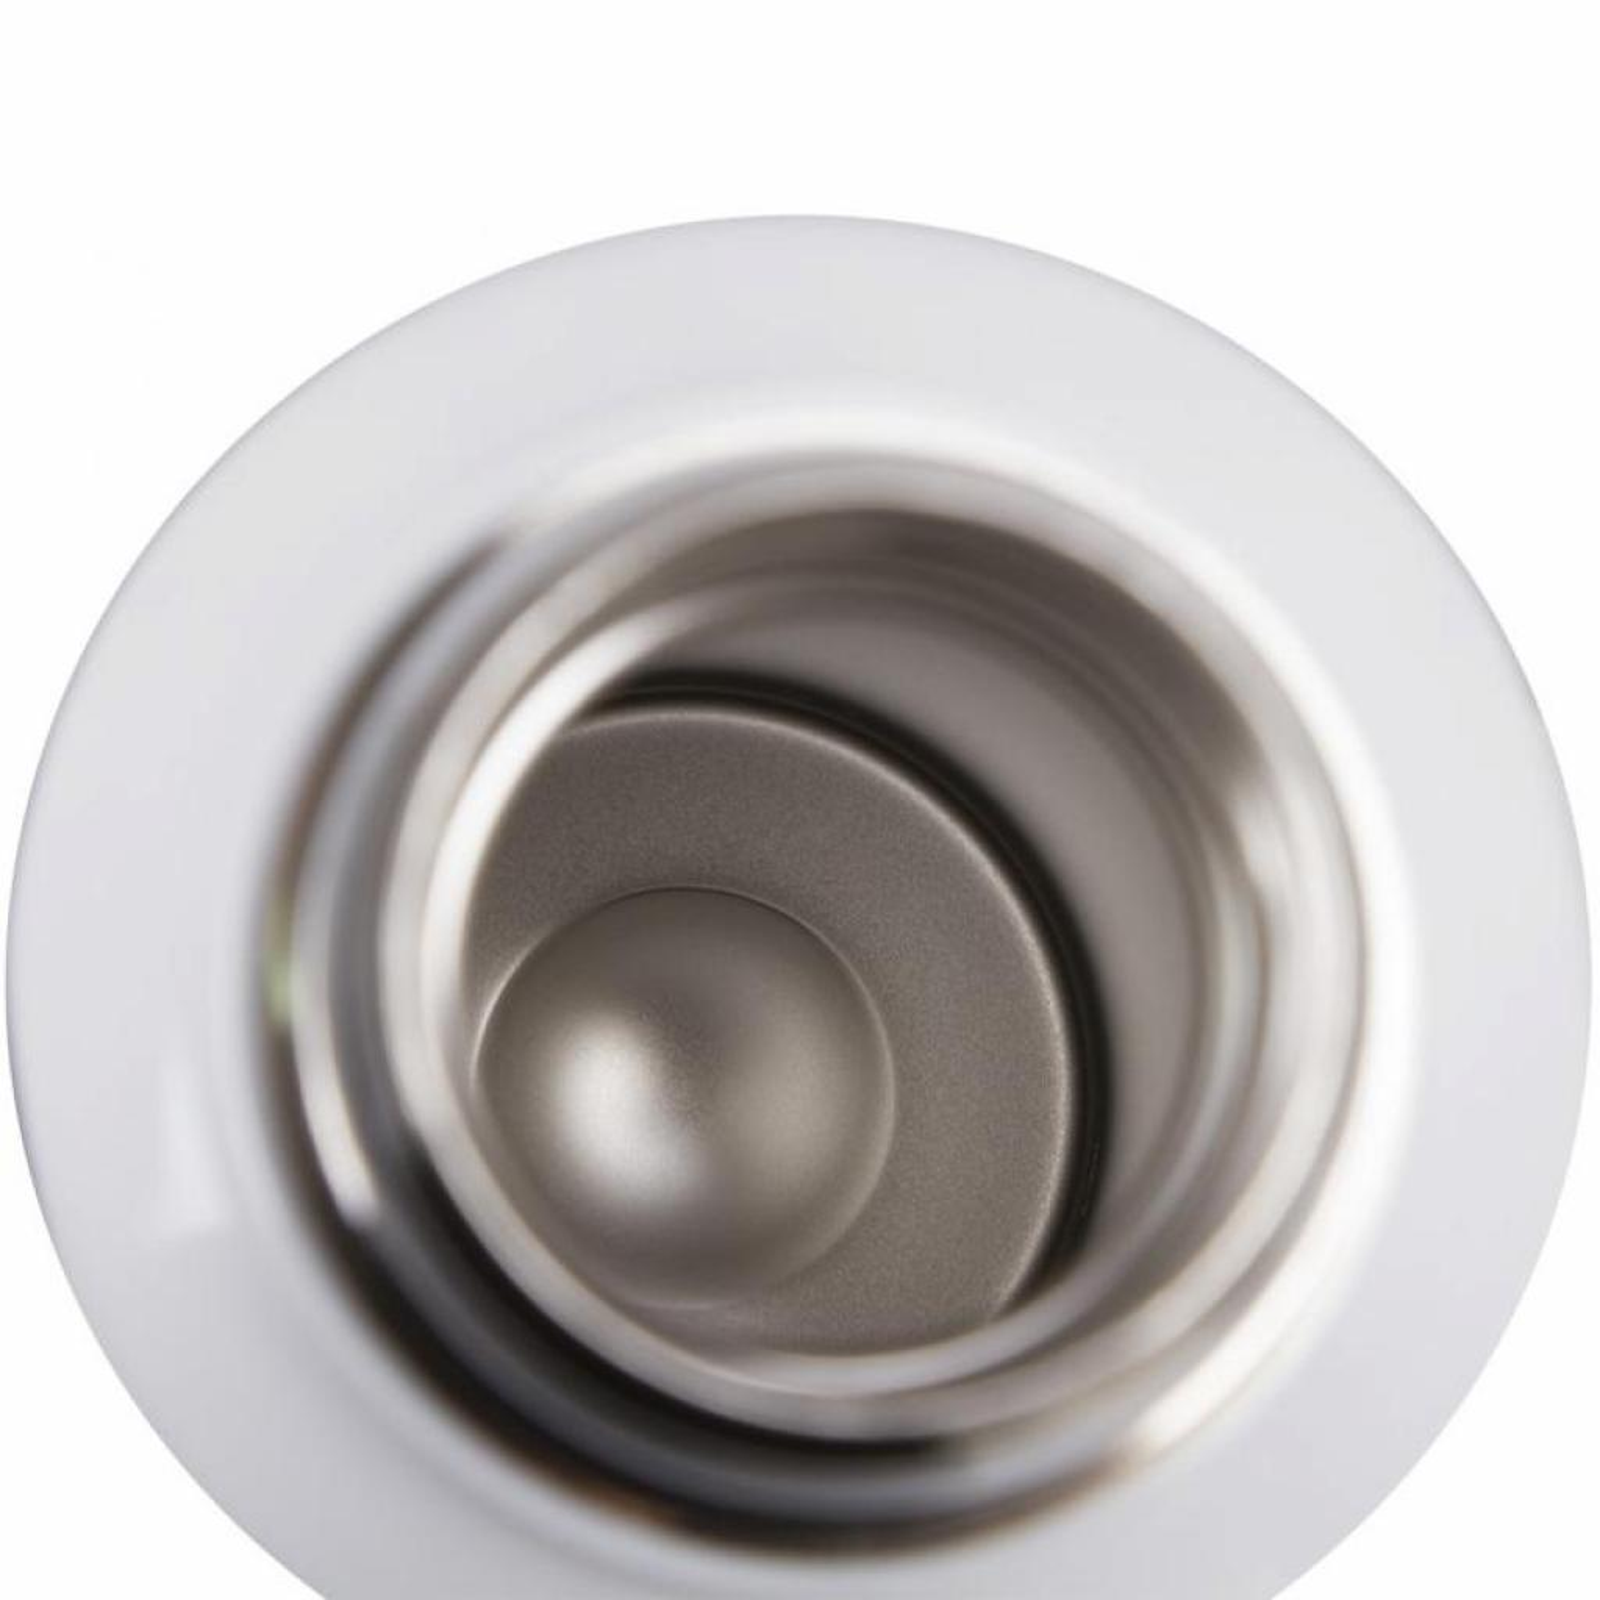 Термос Rondell Absolute White 0.75 л (RDS-444) изображение 4